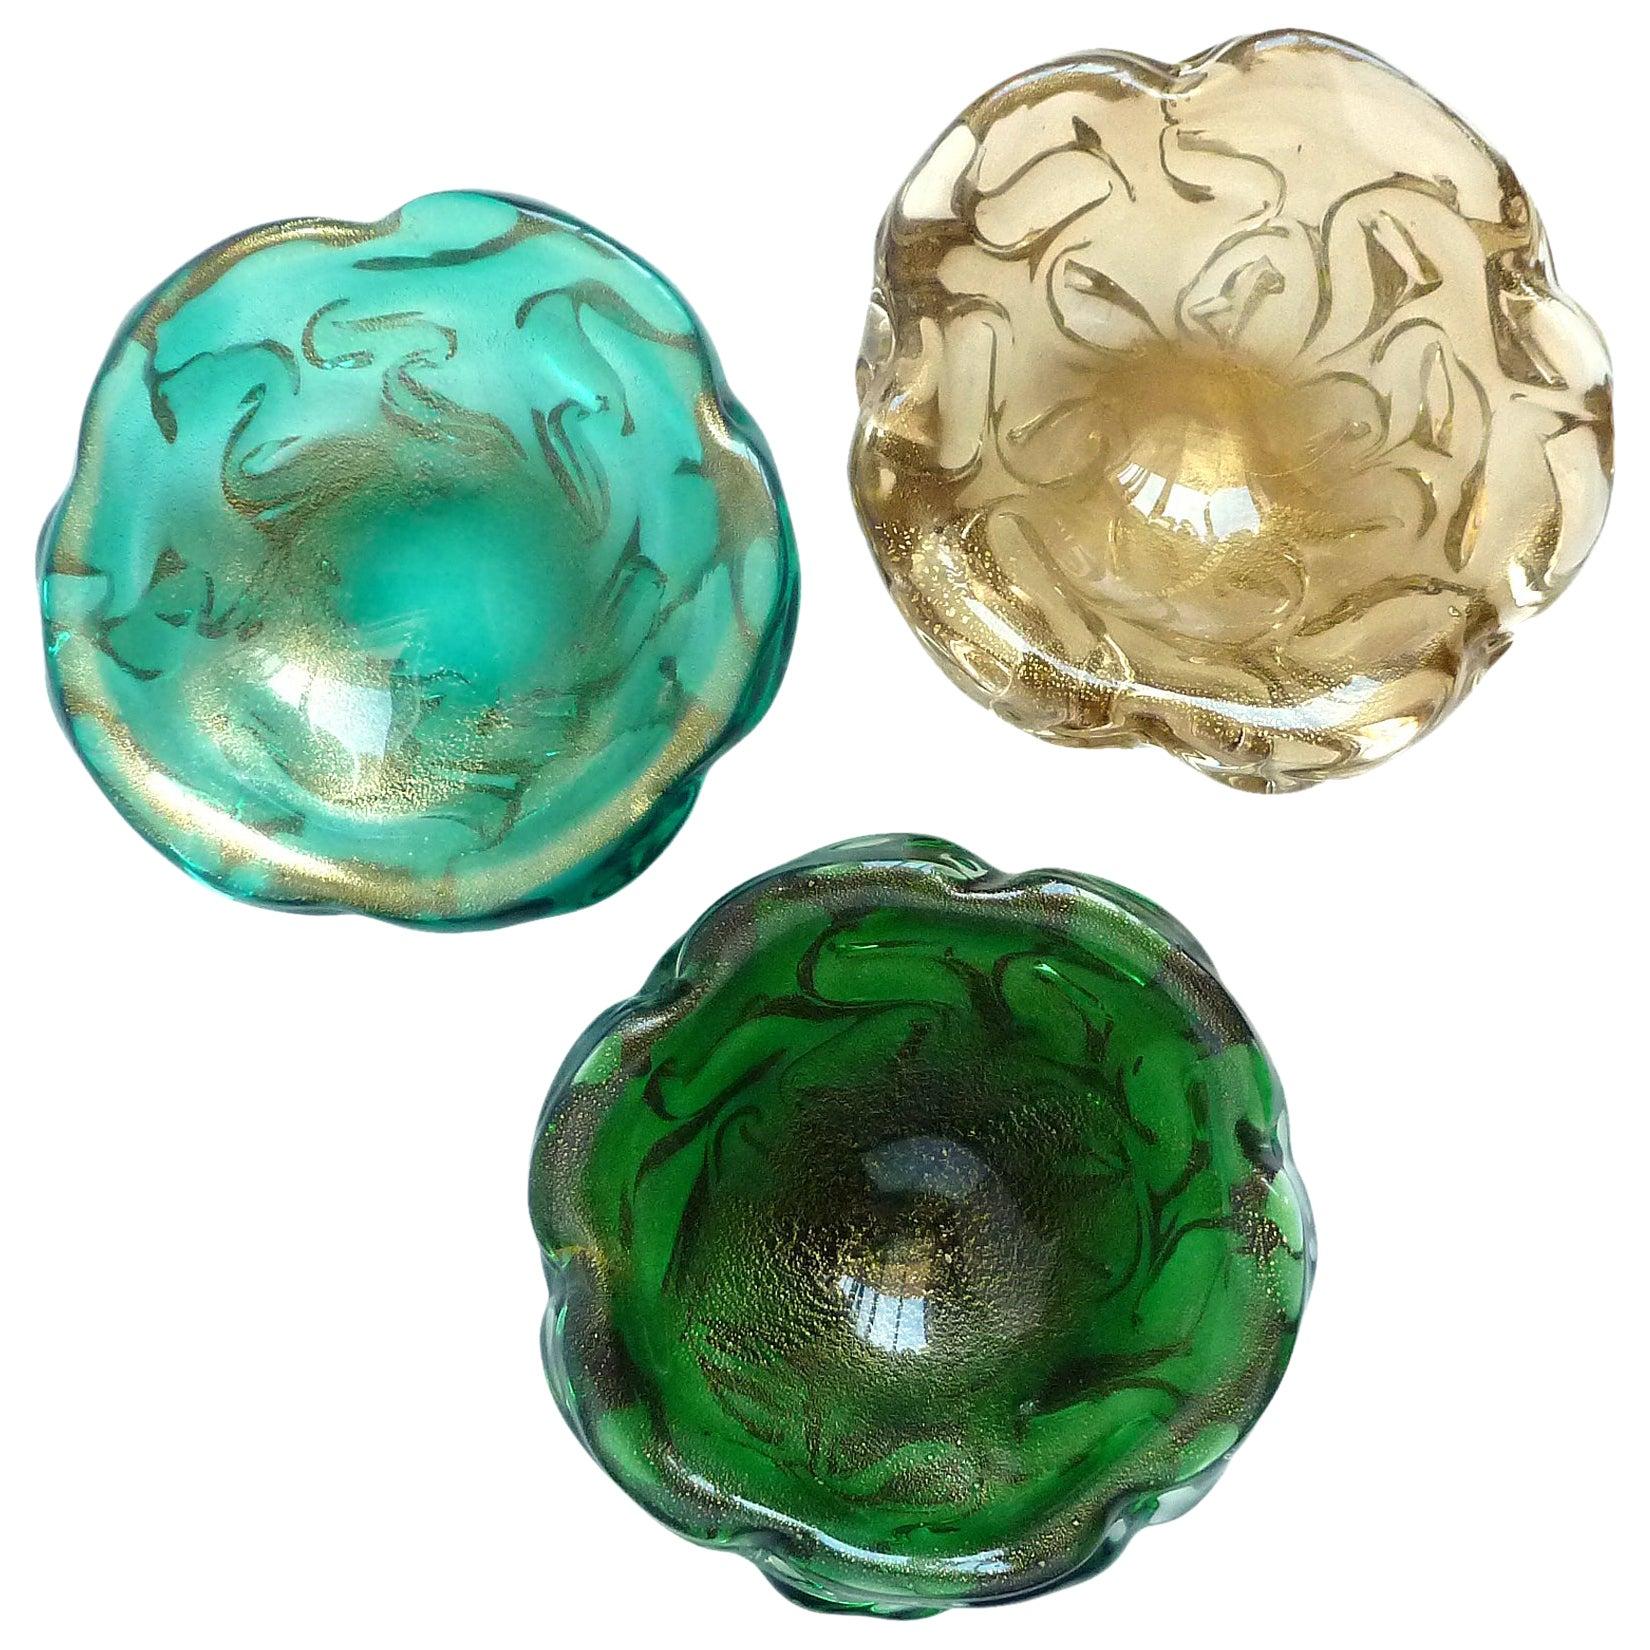 Seguso Vetri d'Arte Murano Gold Flecks Coral Design Italian Art Glass Ring Bowls